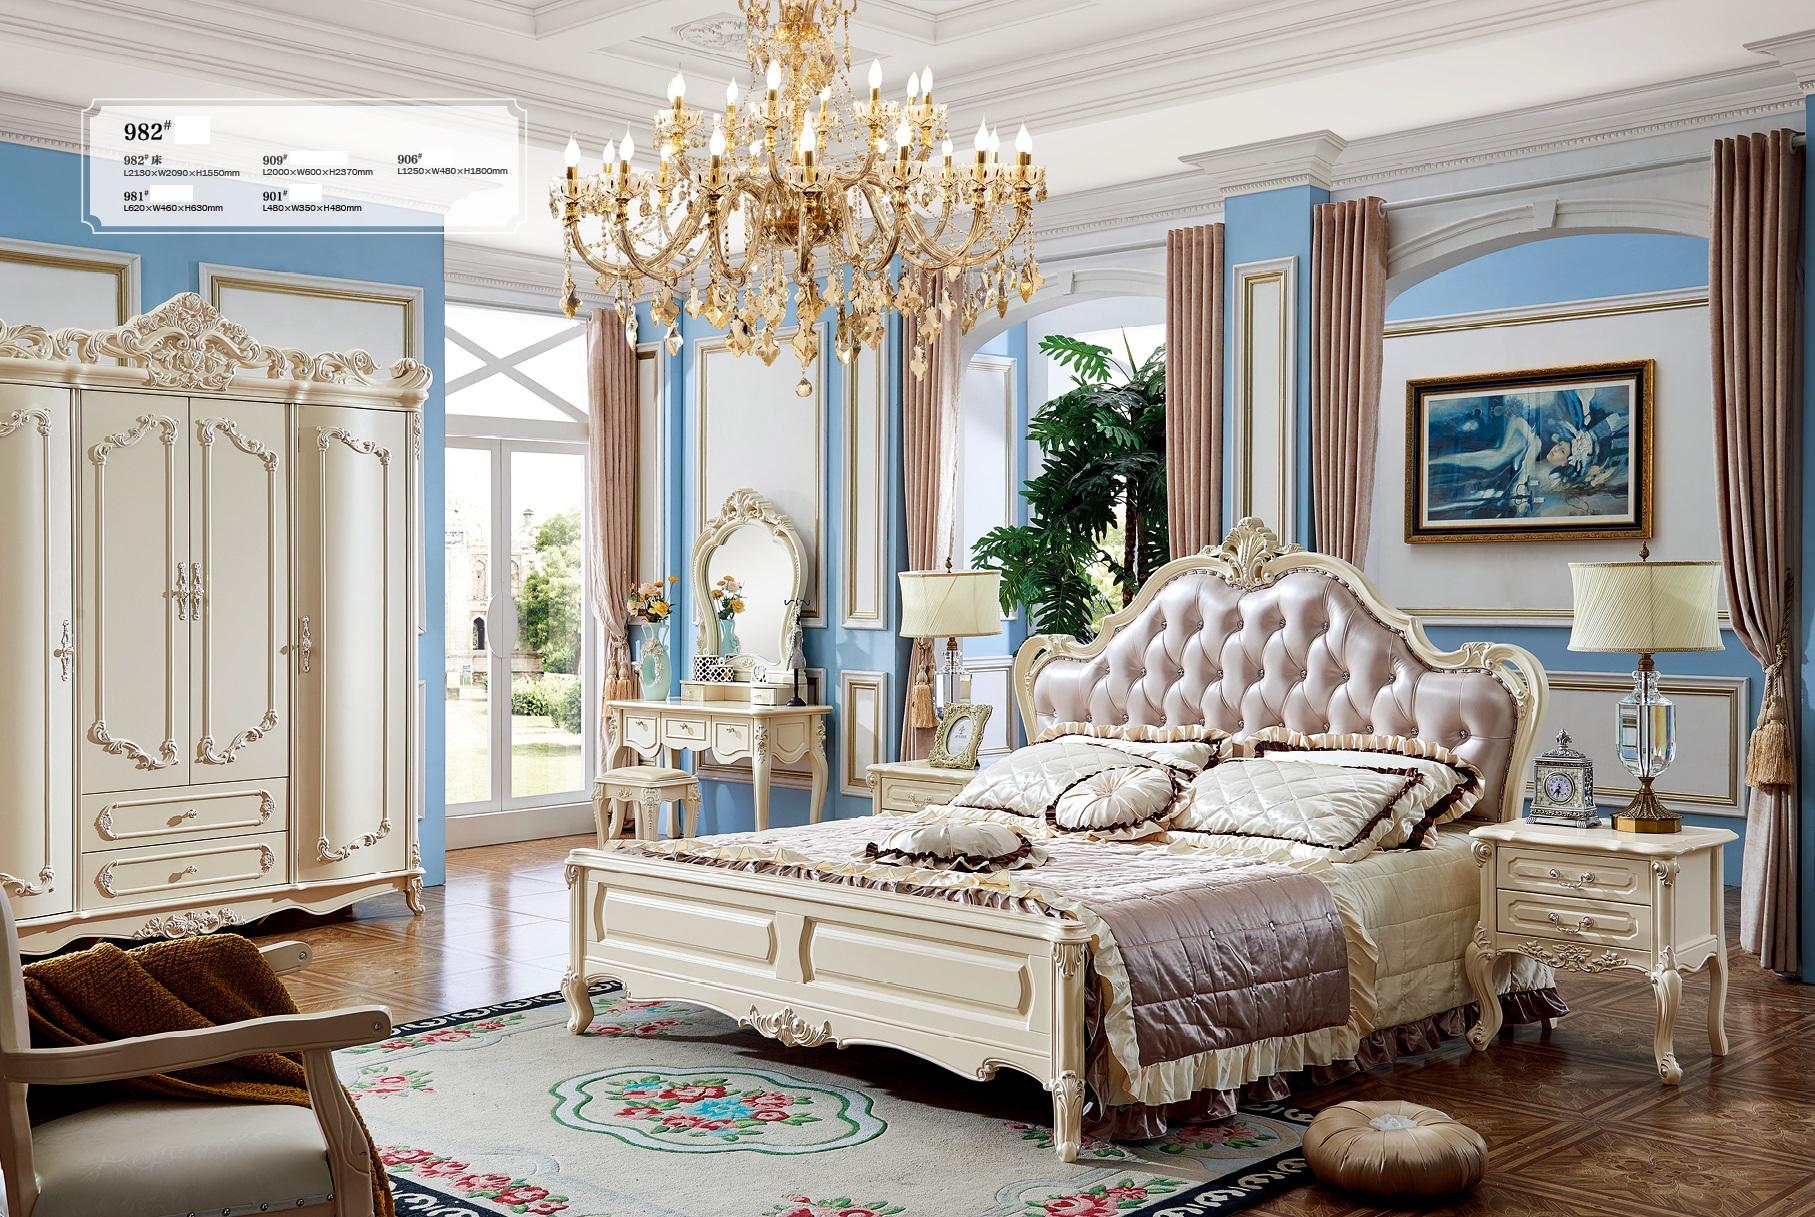 Full Size of Bett Antik Hasena Trends Betten Bette Floor Mit Lattenrost Treca 180x200 Wildeiche Musterring Einfaches Frankfurt Bett Bett Antik